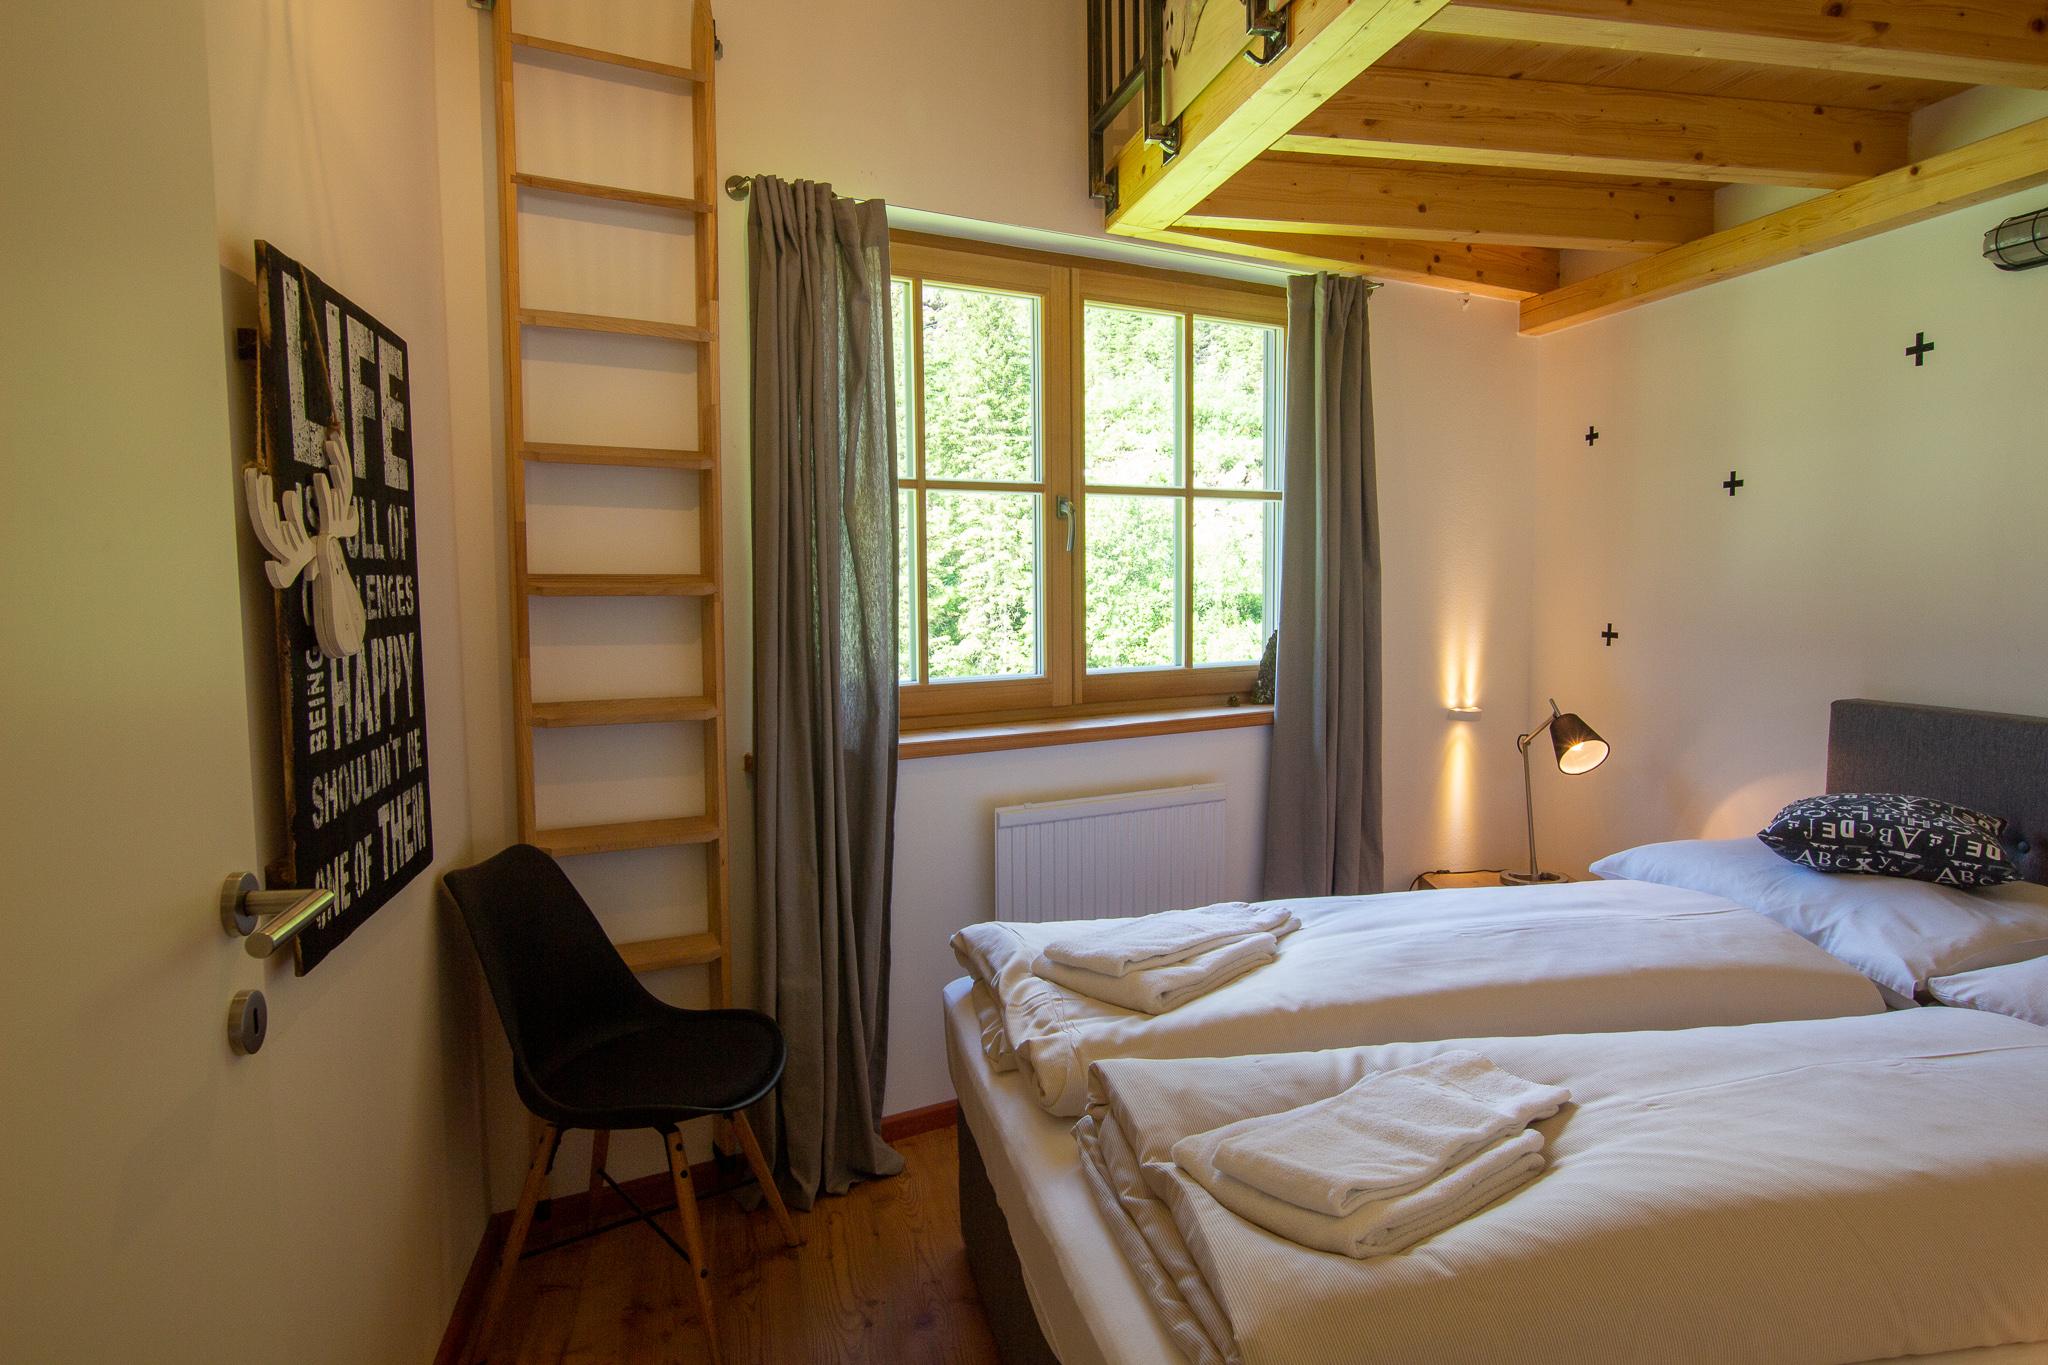 Maison de vacances Lodge Seeblick am Skilift und Bergsee für 5 (2636751), Uttendorf, Pinzgau, Salzbourg, Autriche, image 16